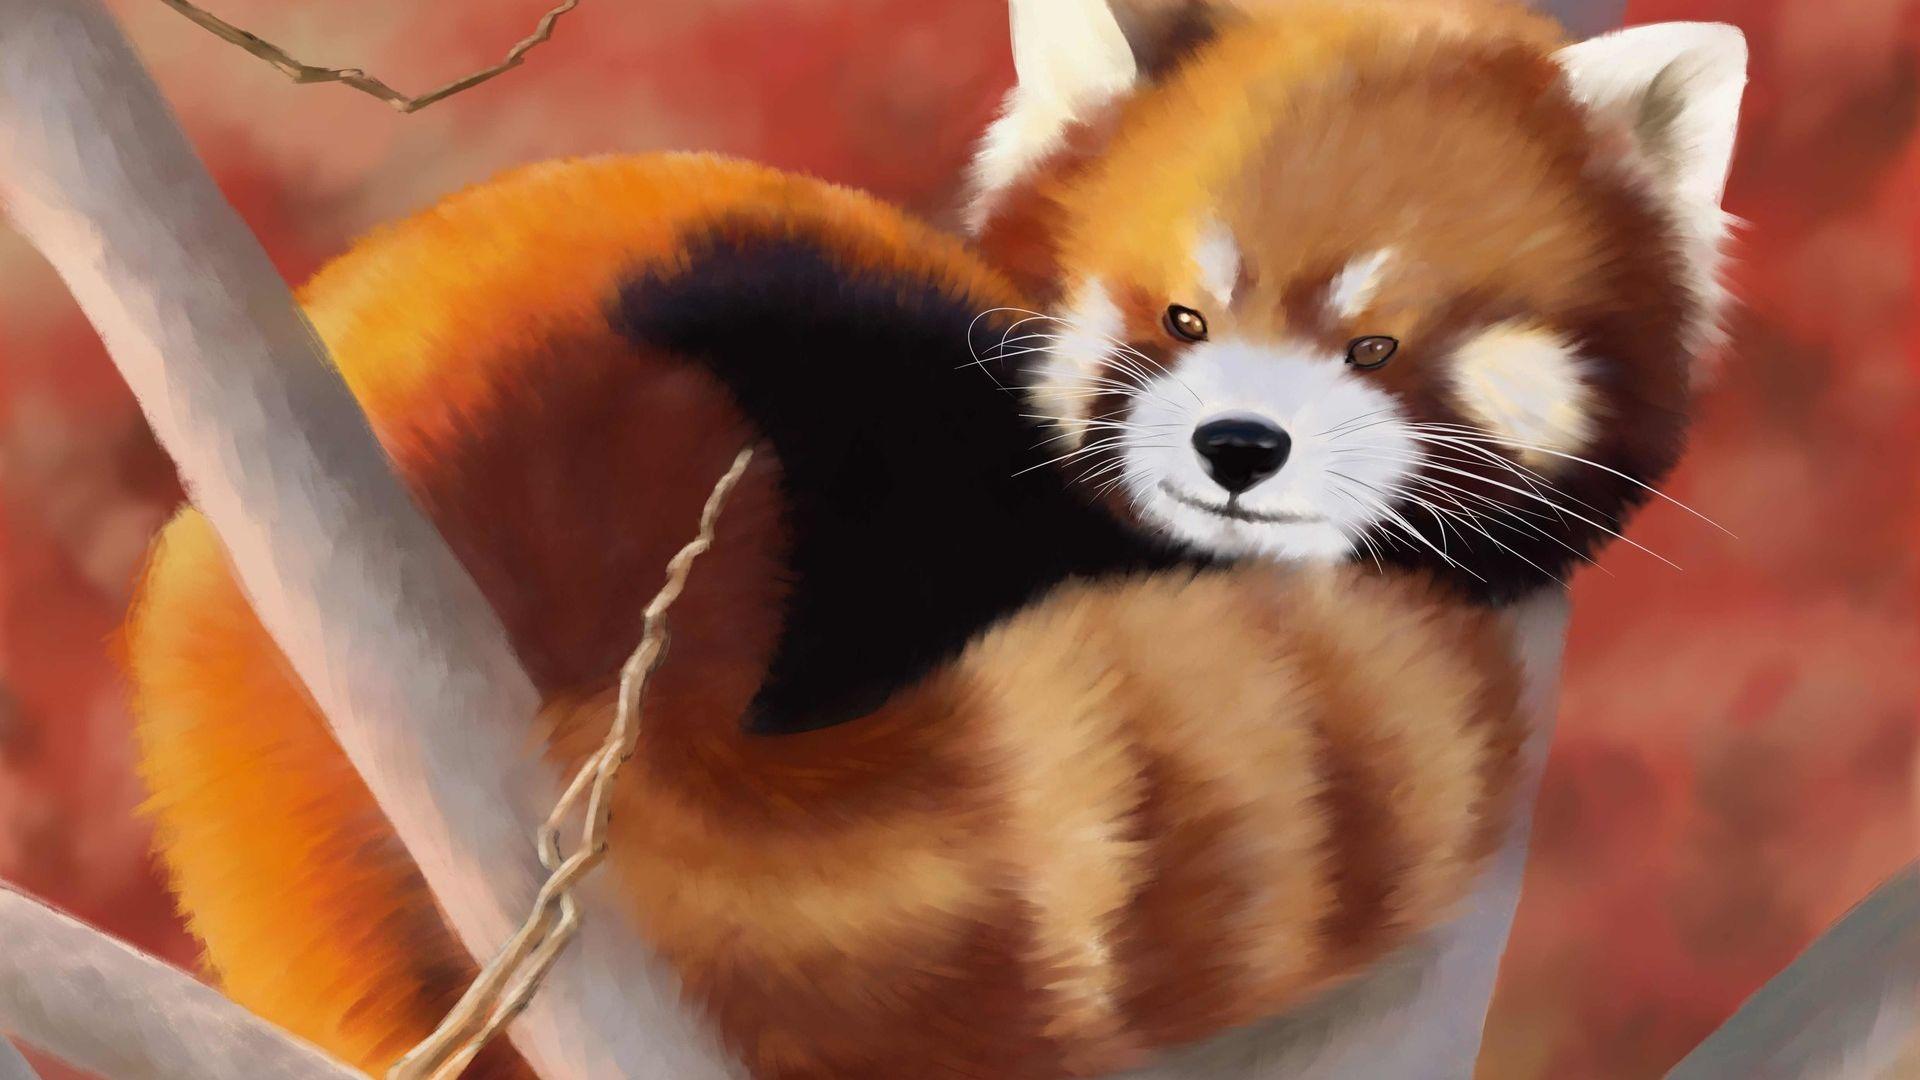 Desktop Wallpaper Red Panda Animal Art Hd Image Picture Background Diqsag